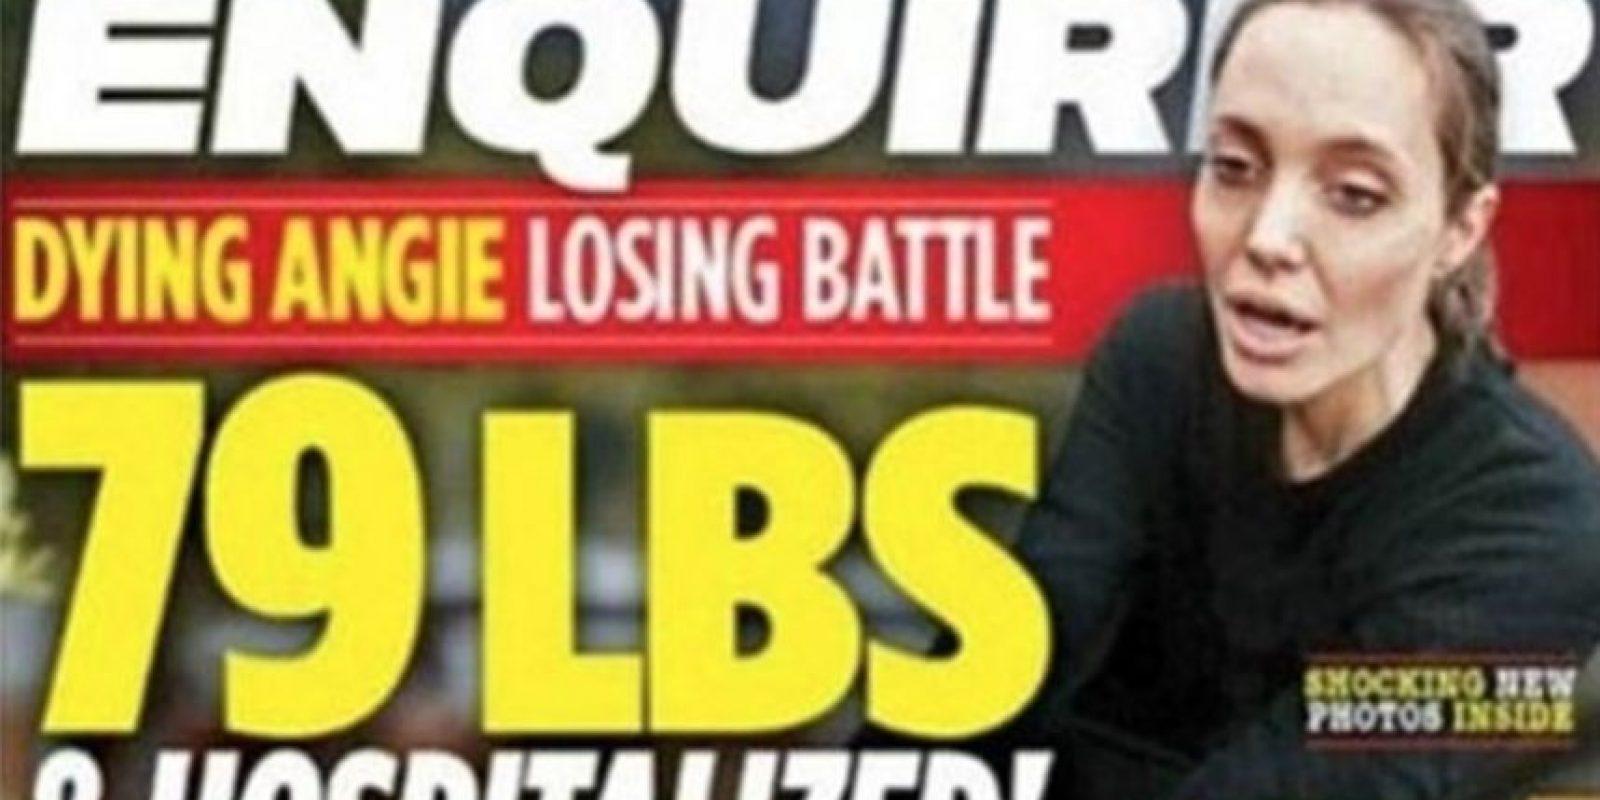 Esta fue la portada del tabloide Foto:The National Enquirer. Imagen Por: